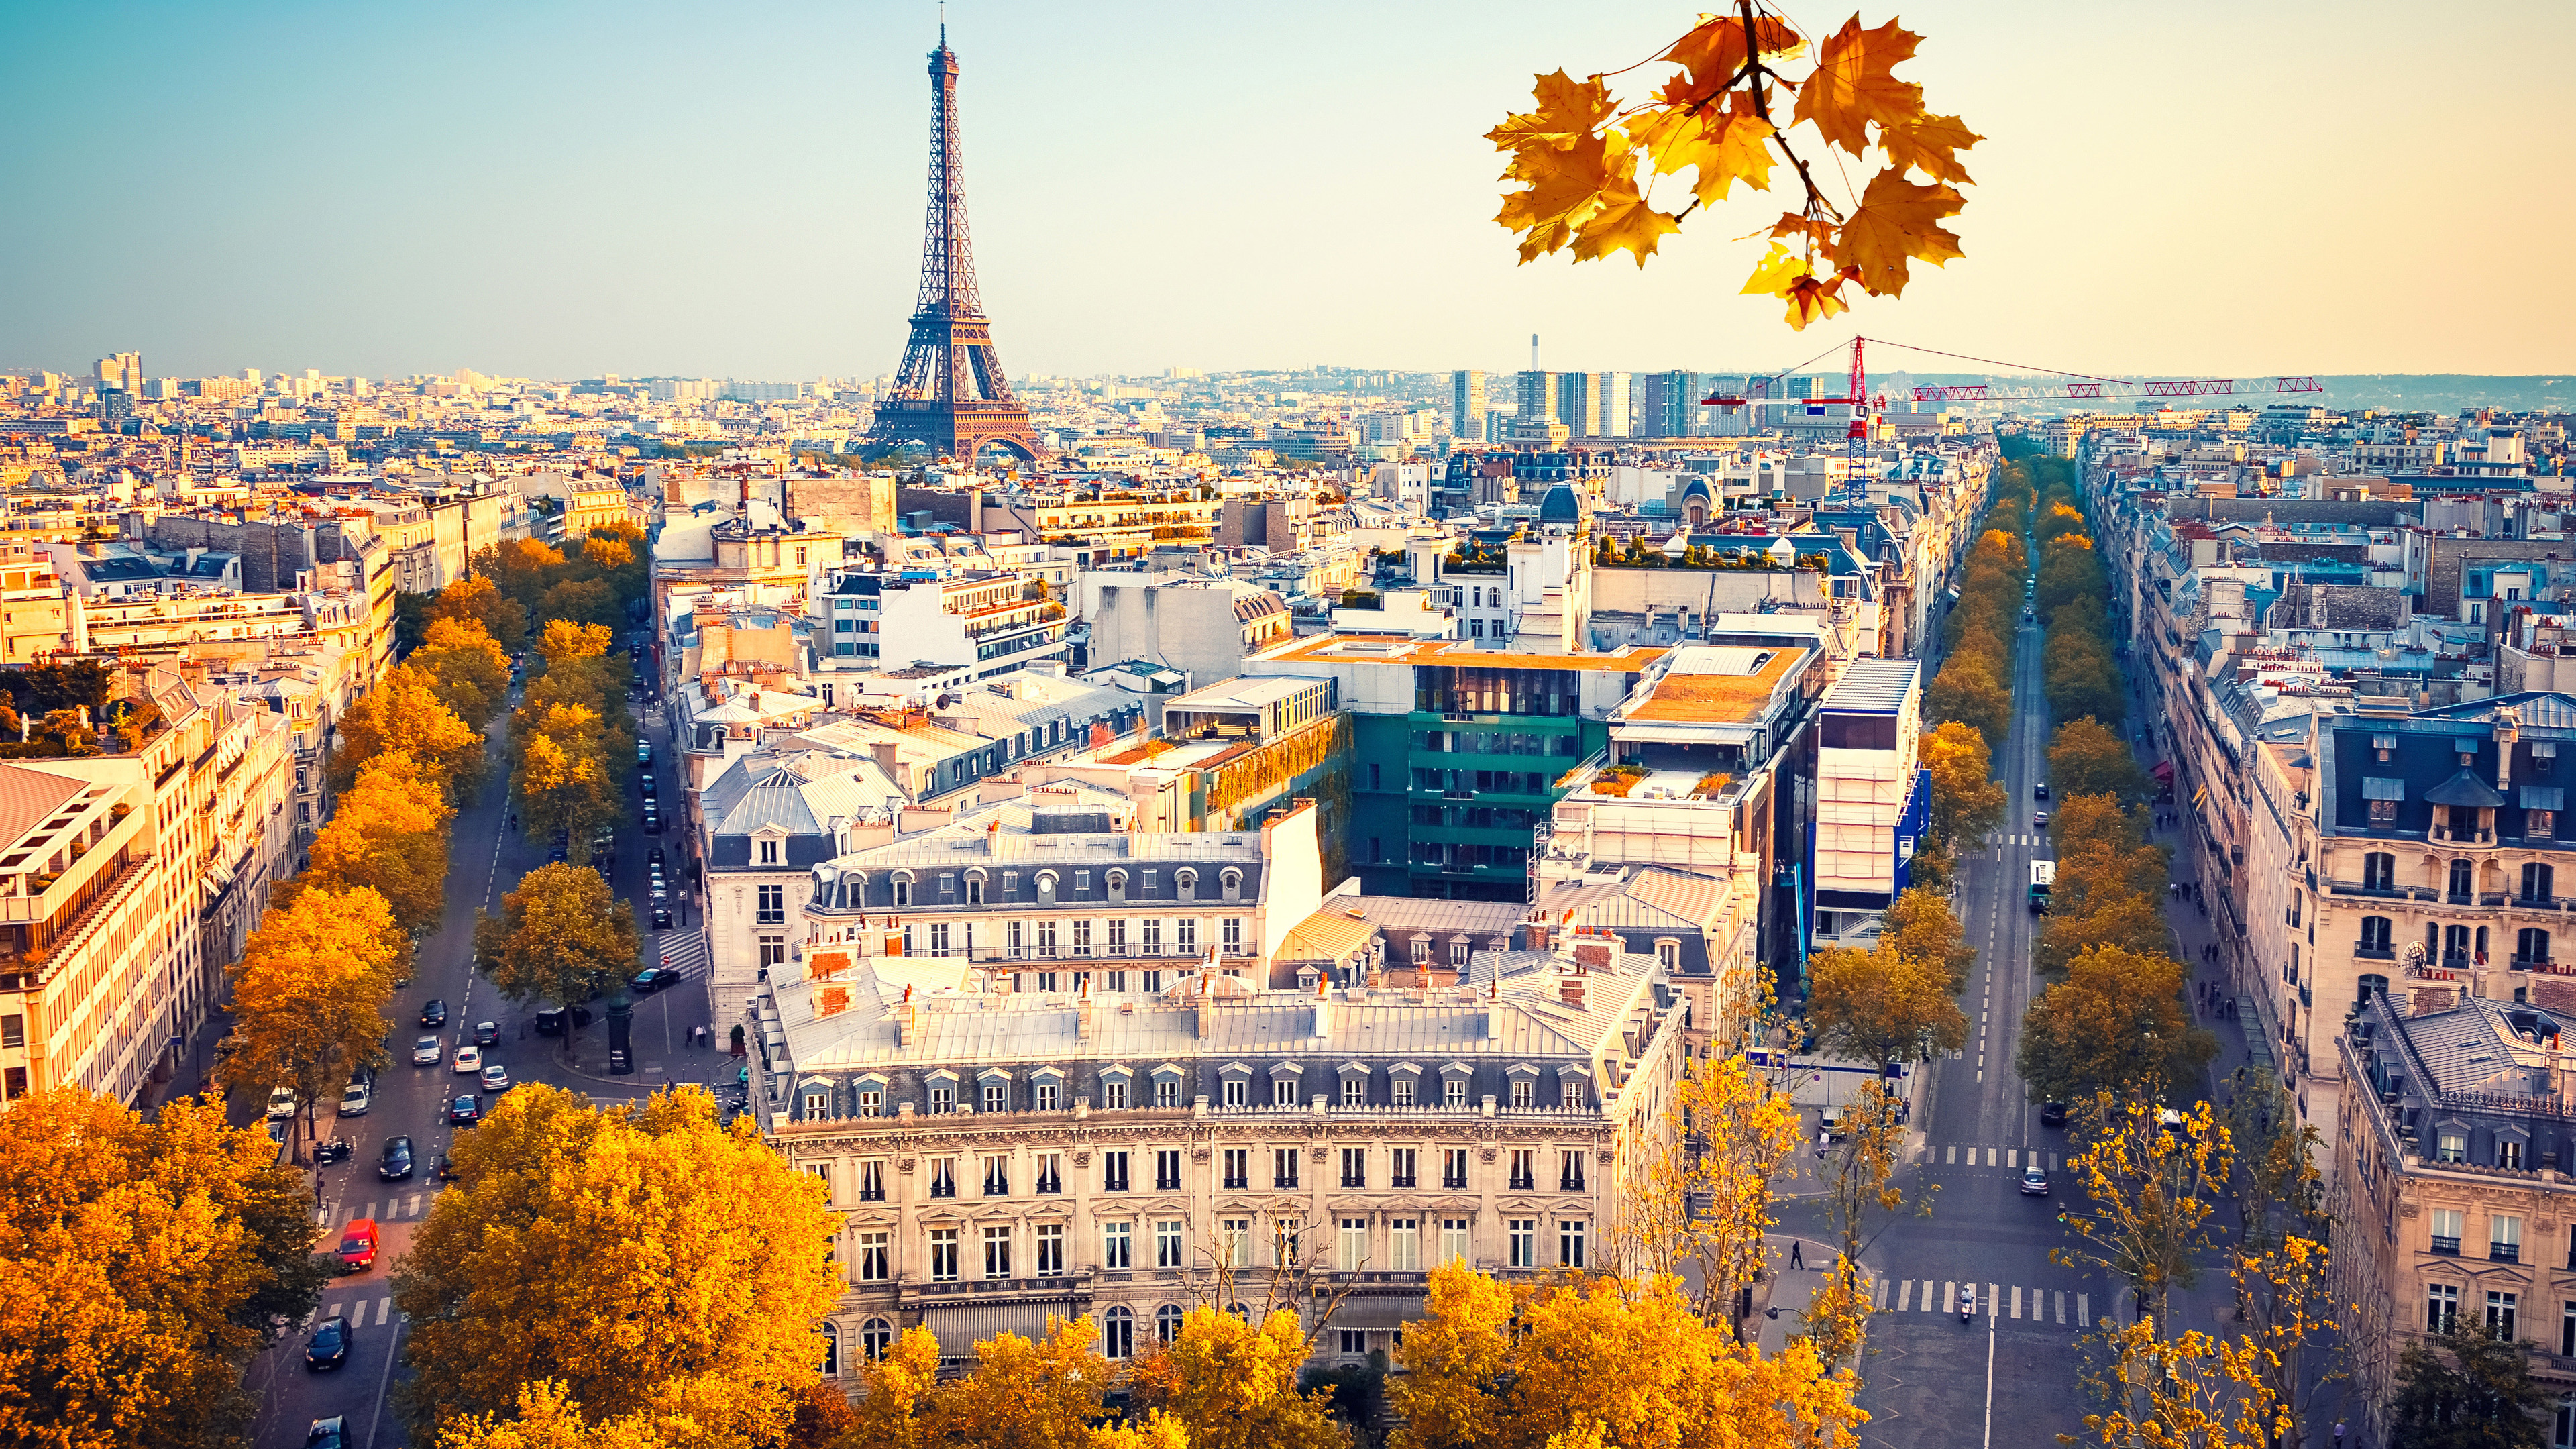 eiffel tower paris city autumn 4k 5k 1538069546 - Eiffel Tower Paris City Autumn 4k 5k - world wallpapers, tower wallpapers, paris wallpapers, hd-wallpapers, eiffel tower wallpapers, city wallpapers, autumn wallpapers, 5k wallpapers, 4k-wallpapers